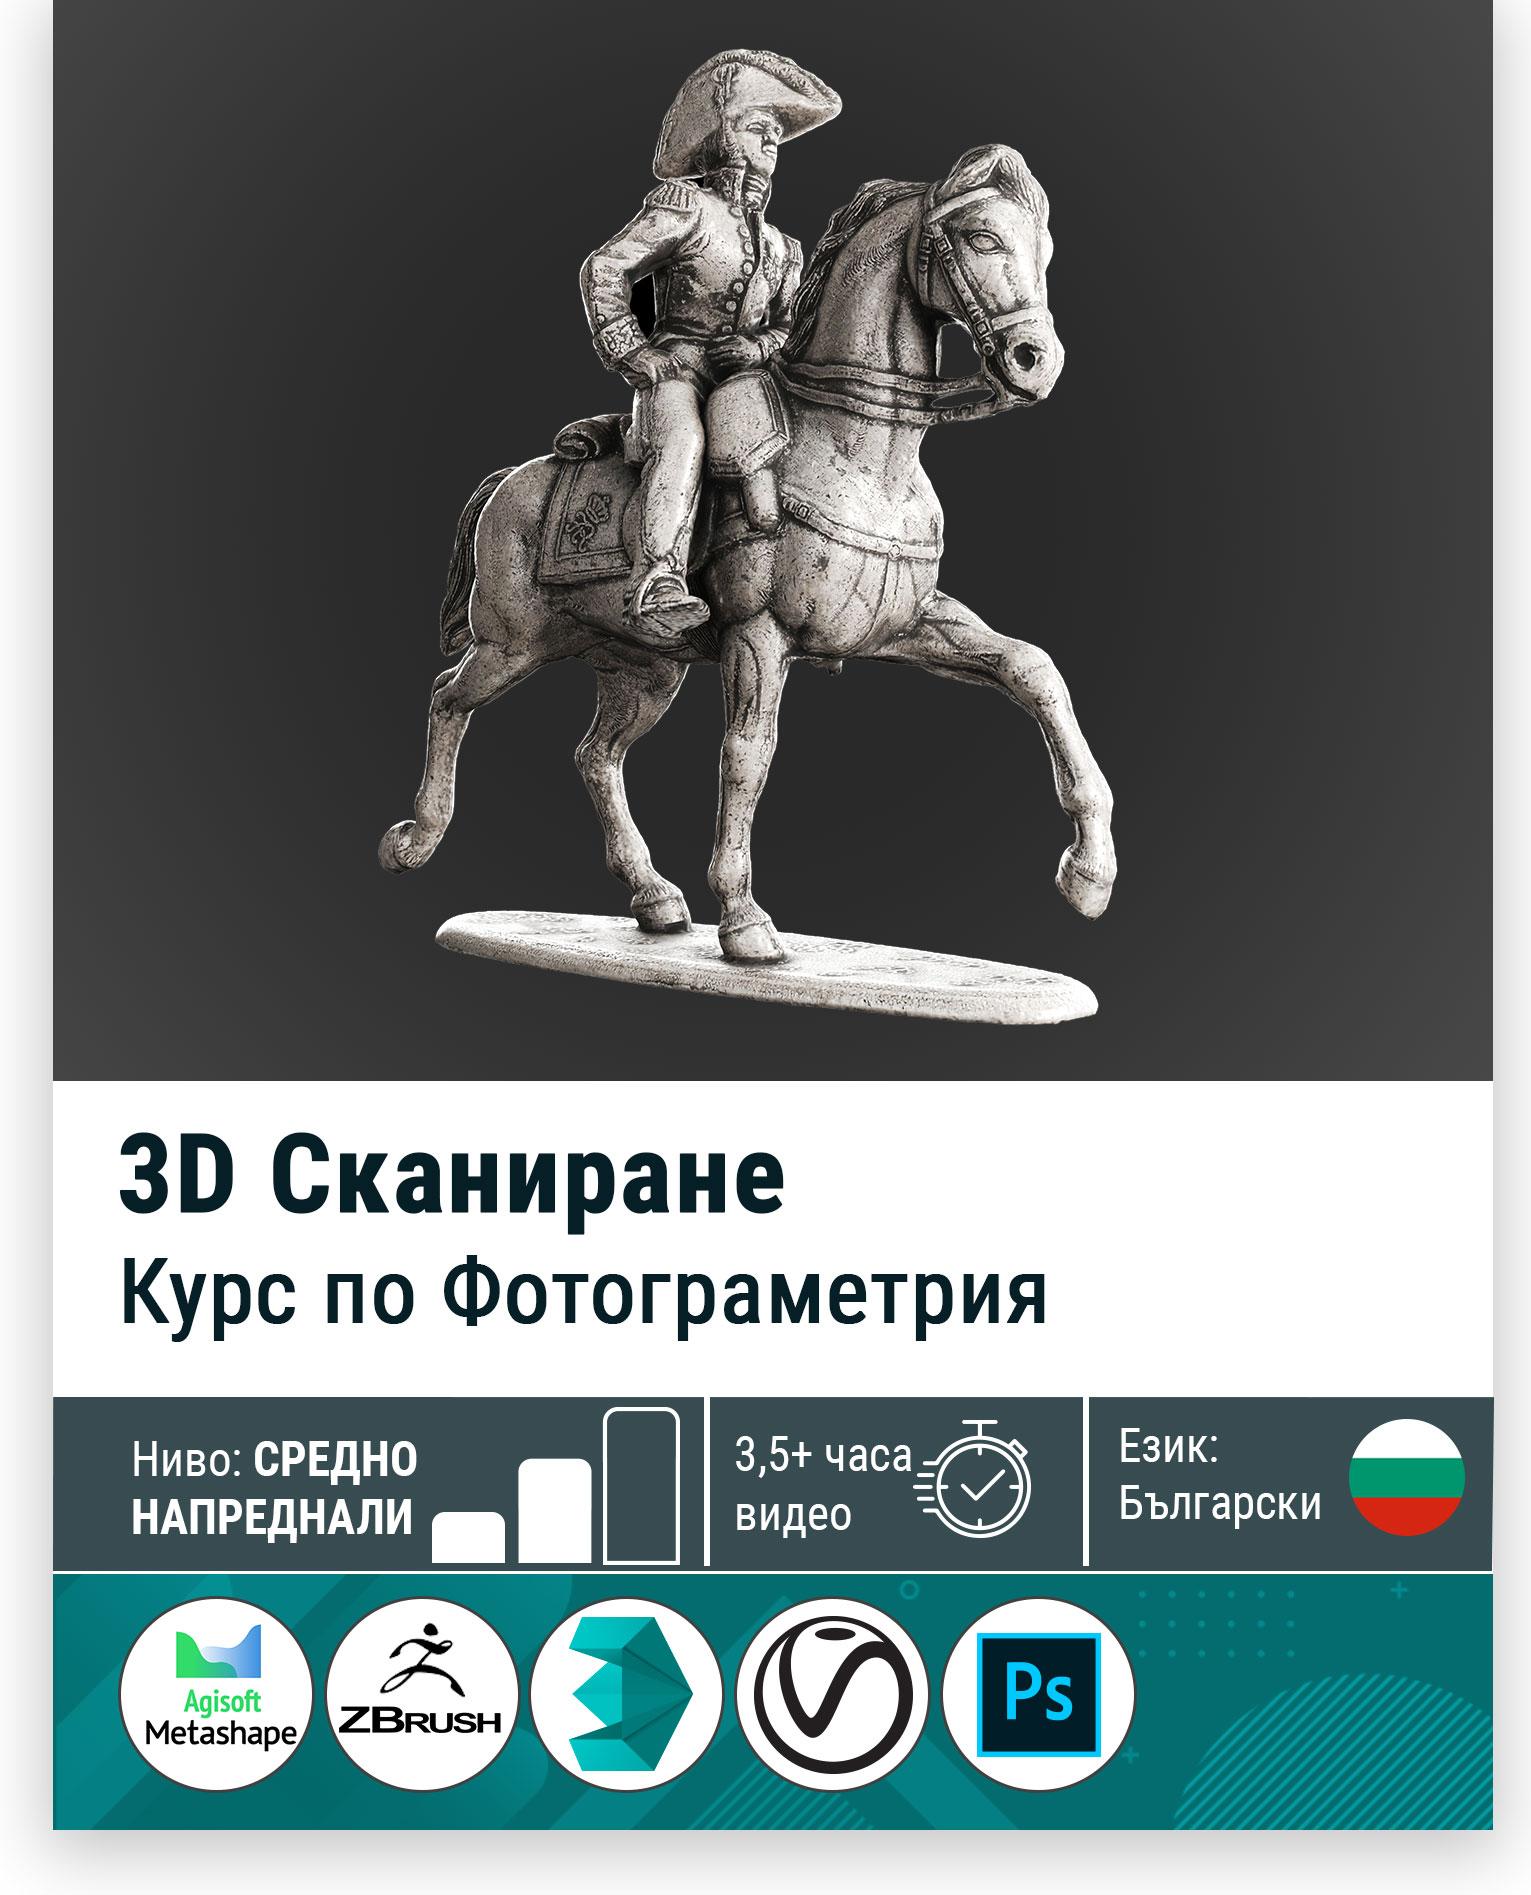 3D Сканиране (Фотограметрия)